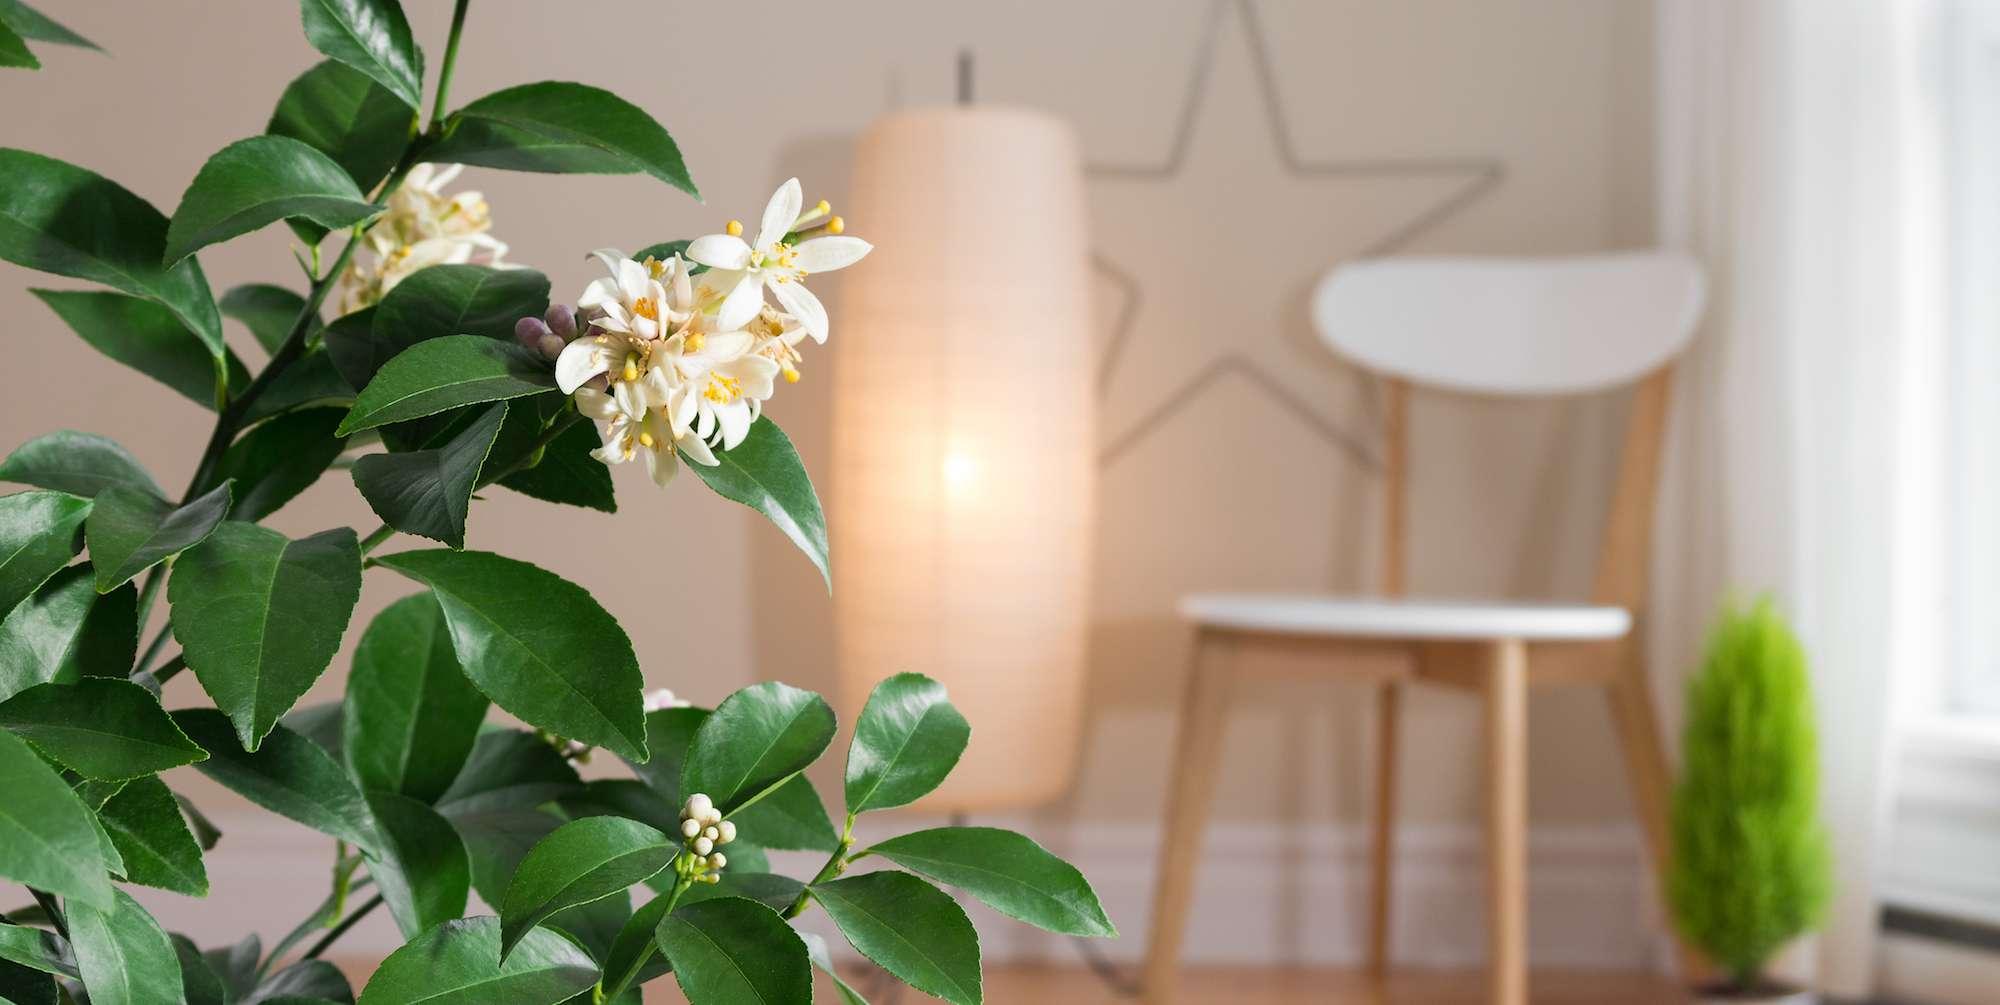 A lemon trees blooms indoors